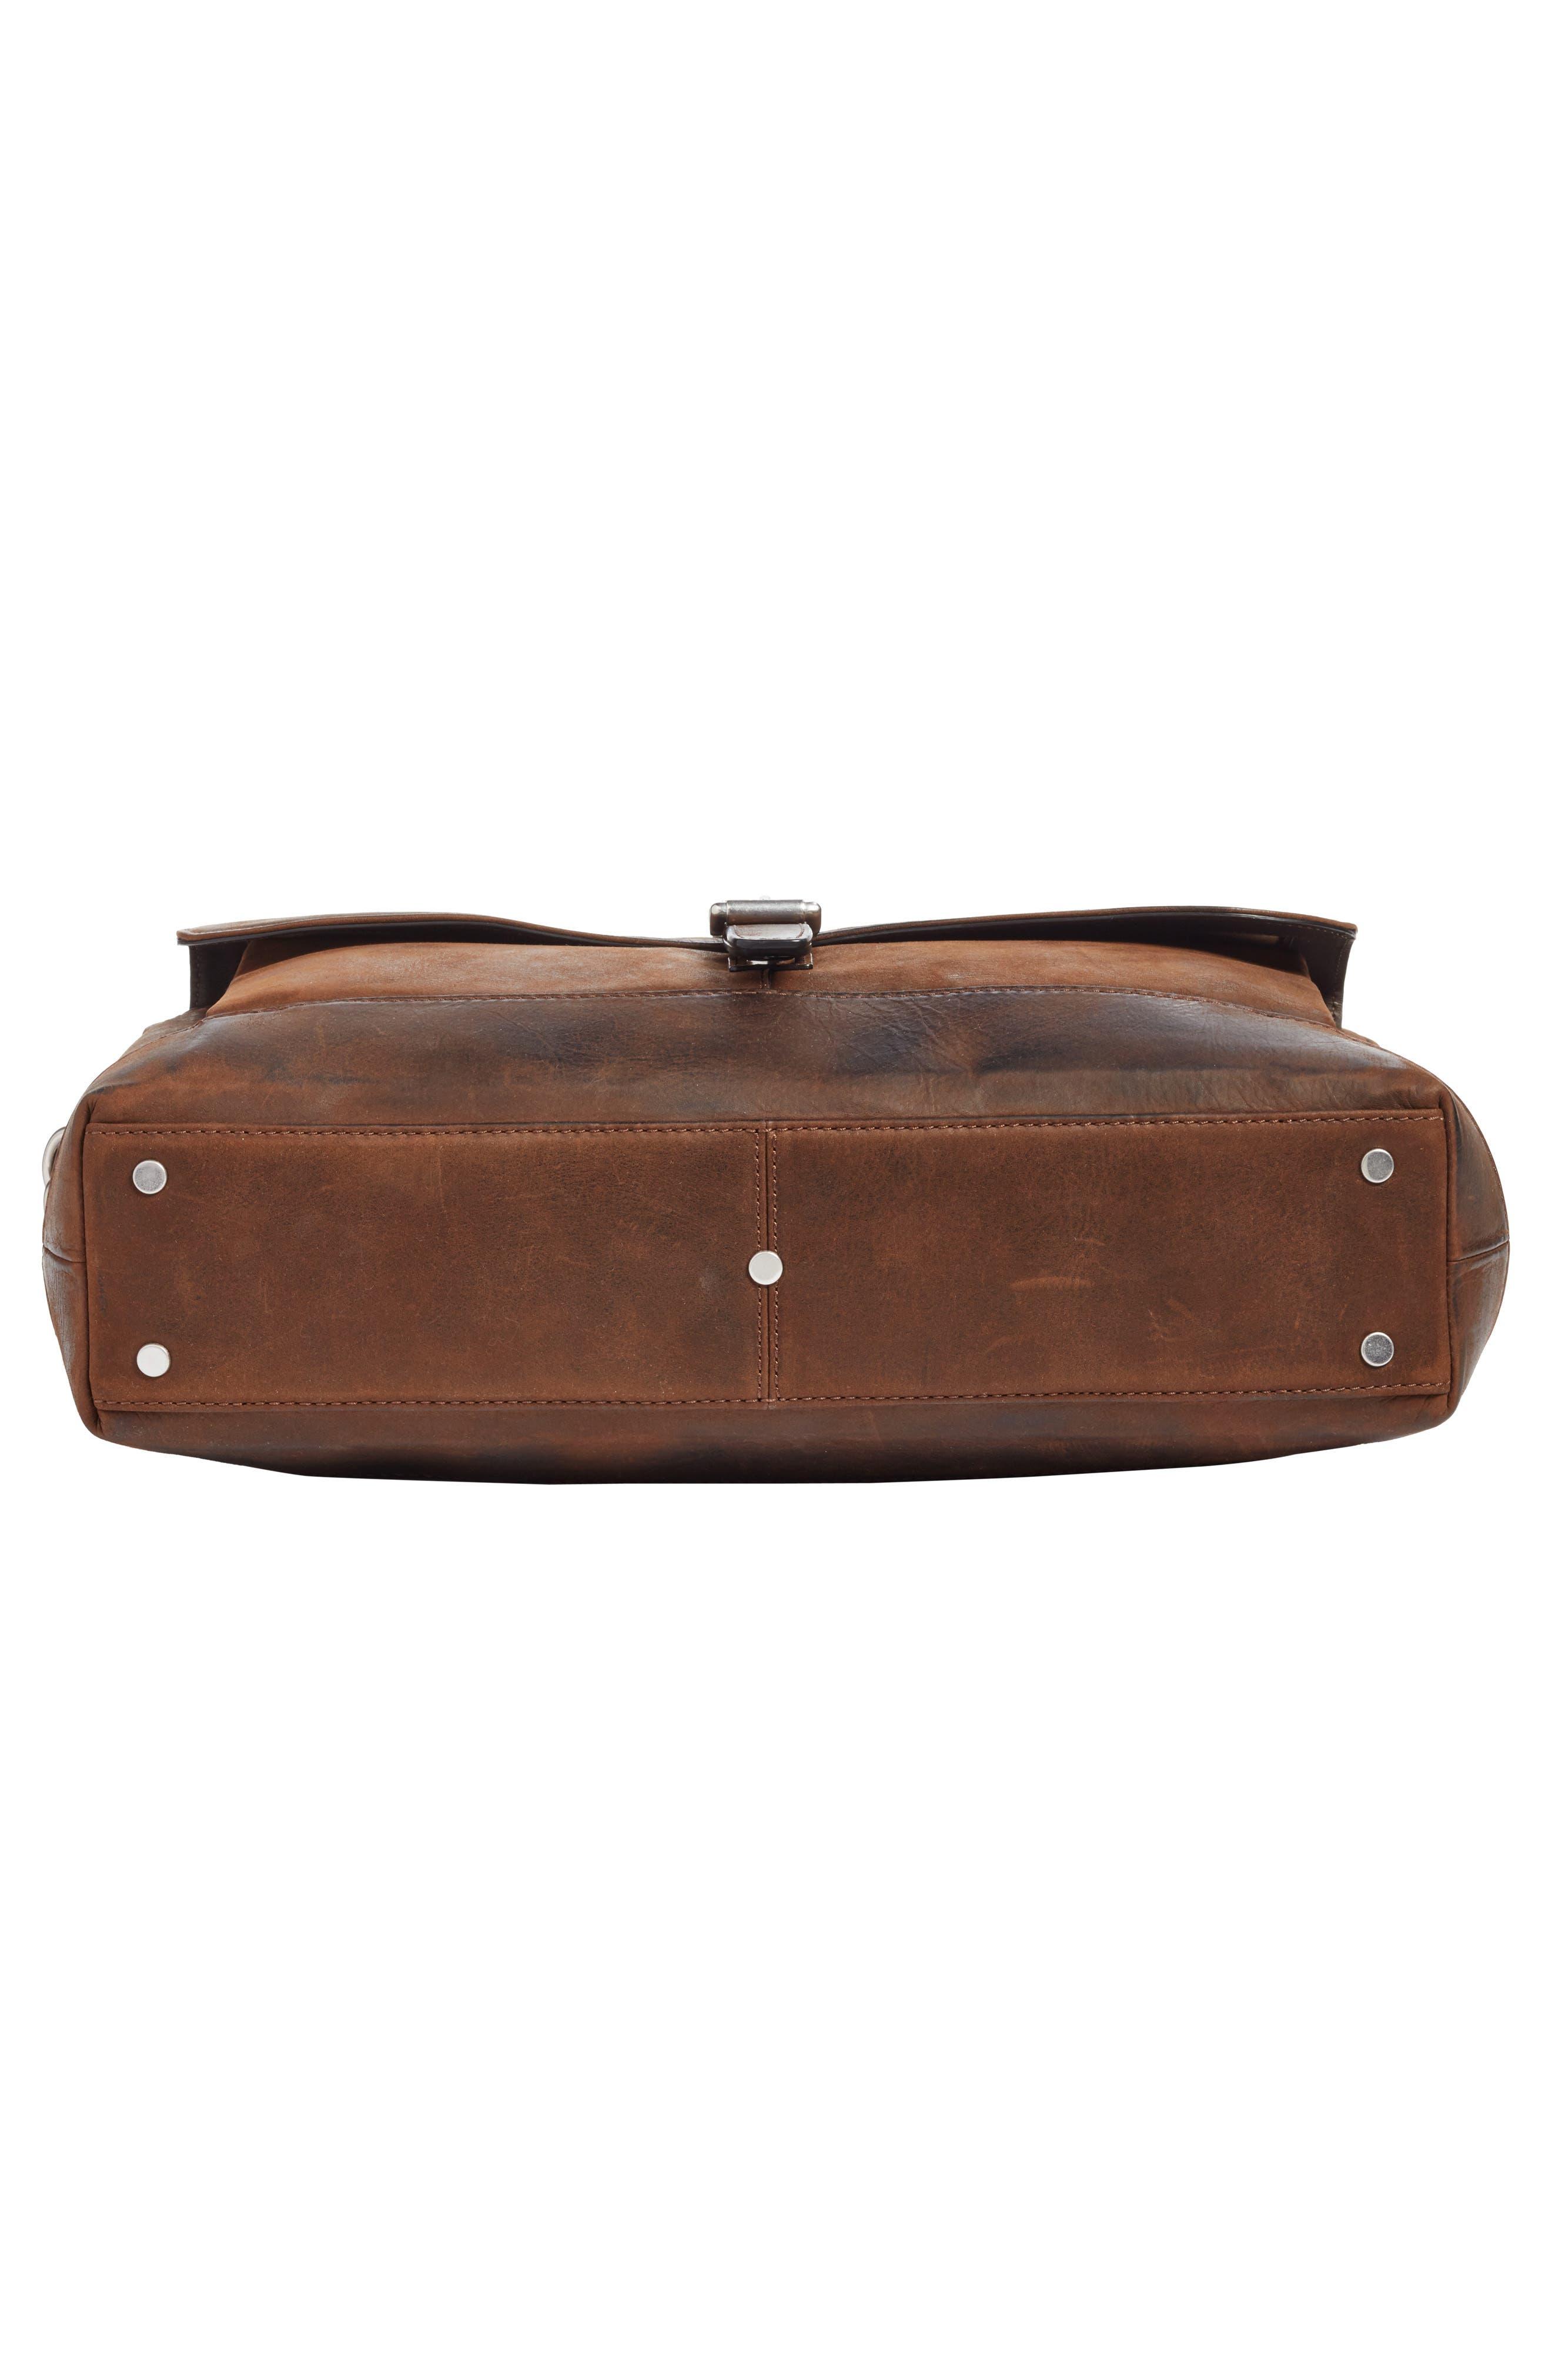 FRYE, Oliver Leather Briefcase, Alternate thumbnail 6, color, DARK BROWN